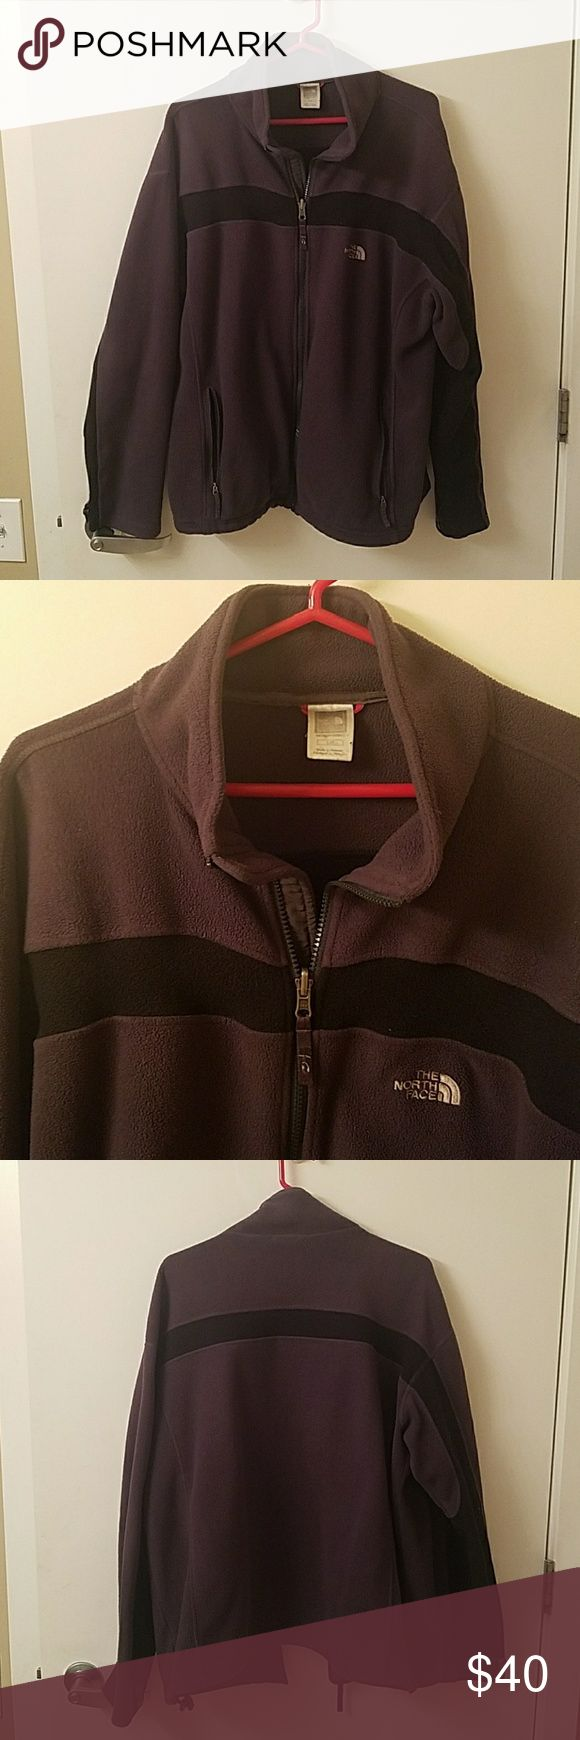 North Face Men's jacket Men's large lightweight North Face jacket, good condition North Face Jackets & Coats